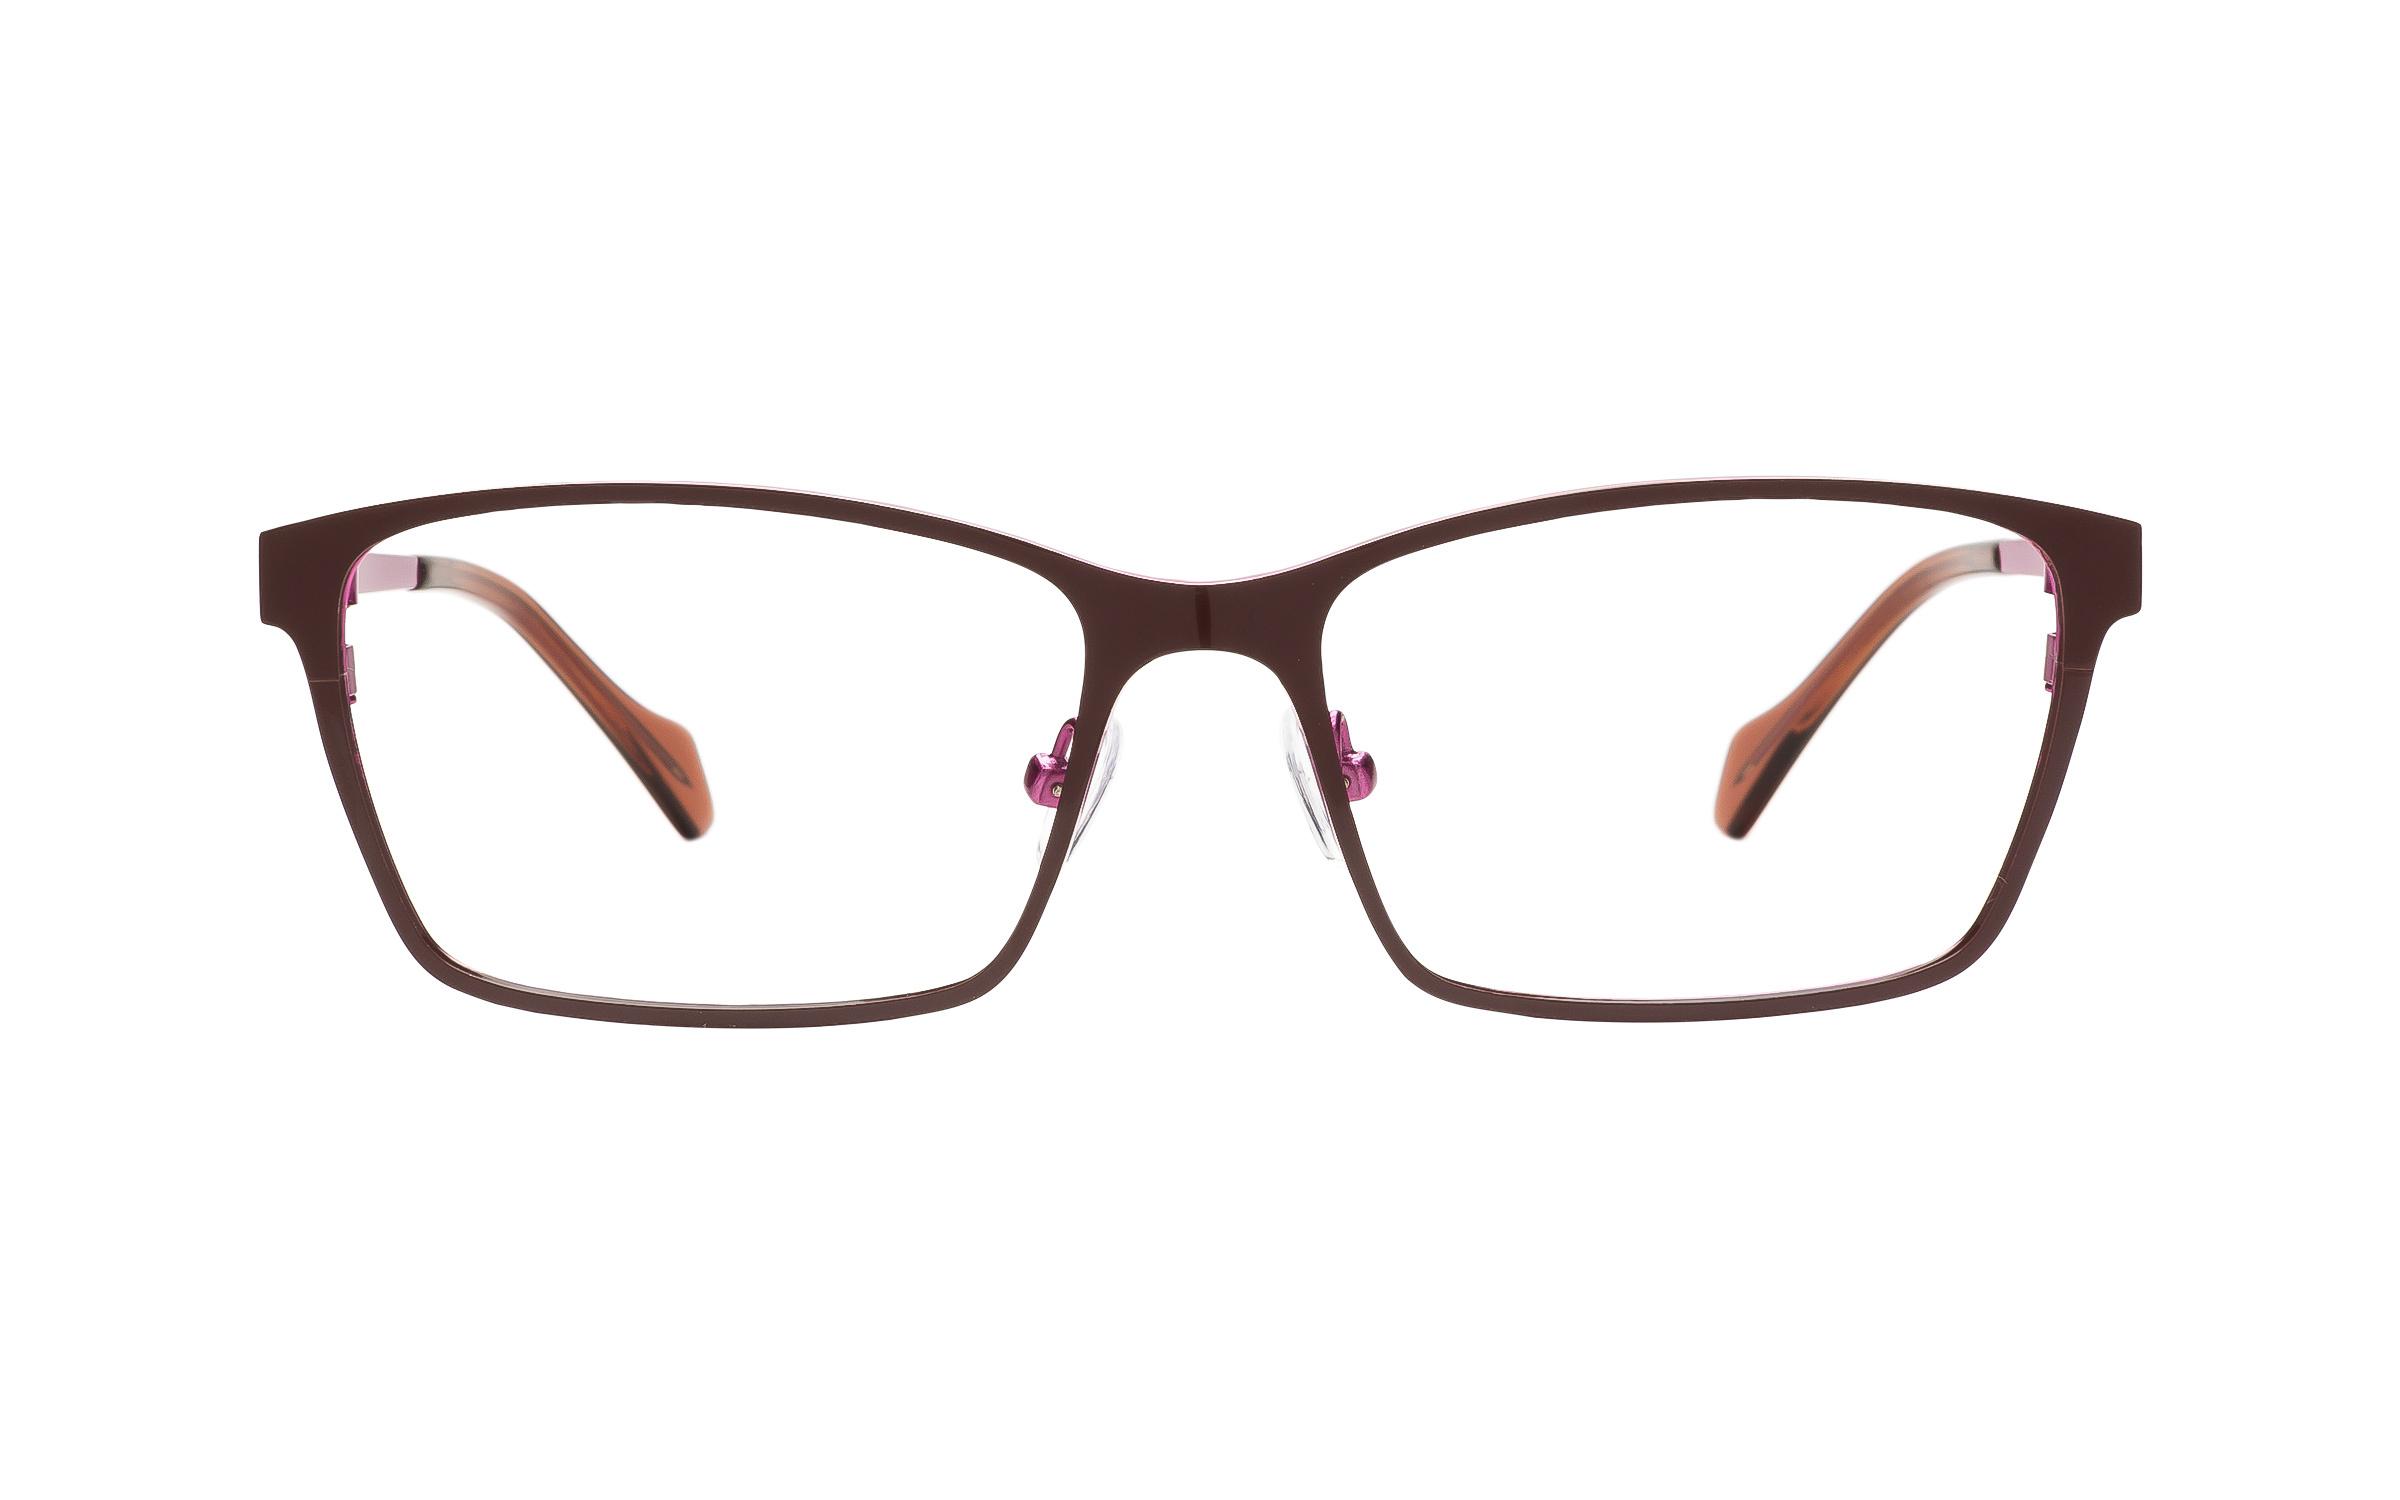 Jai Kudo 560 M03 Toffee Hot Pink Glasses, Eyeglasses & Fr...